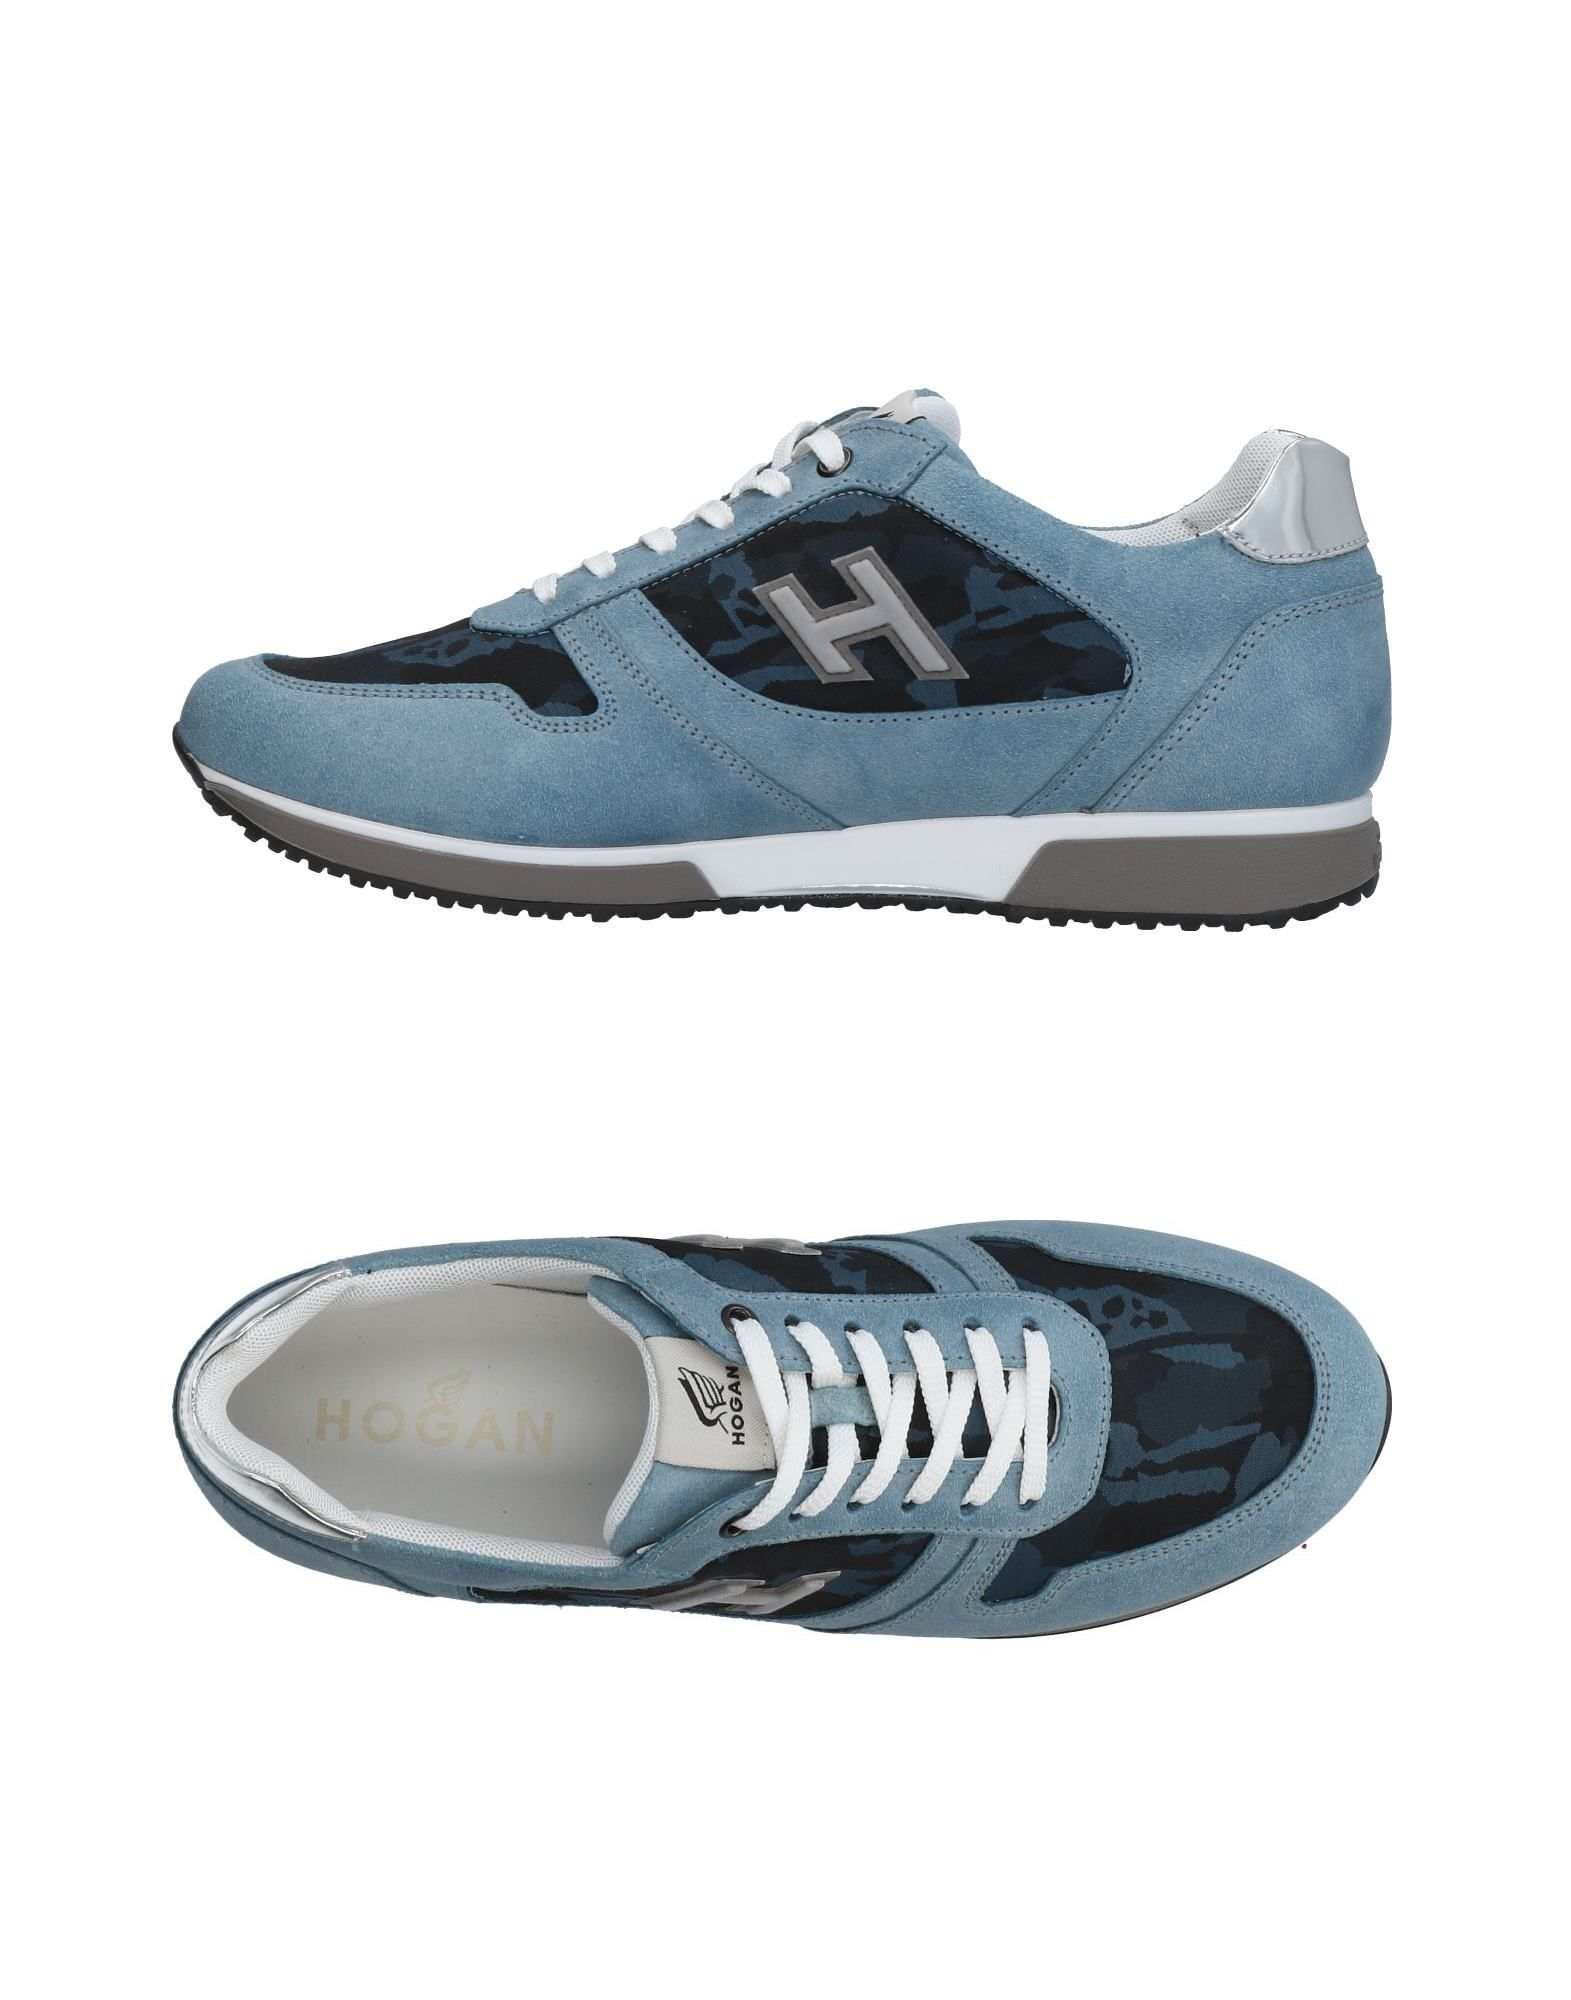 Hogan Sneakers Herren  11435507FM Gute Qualität beliebte Schuhe